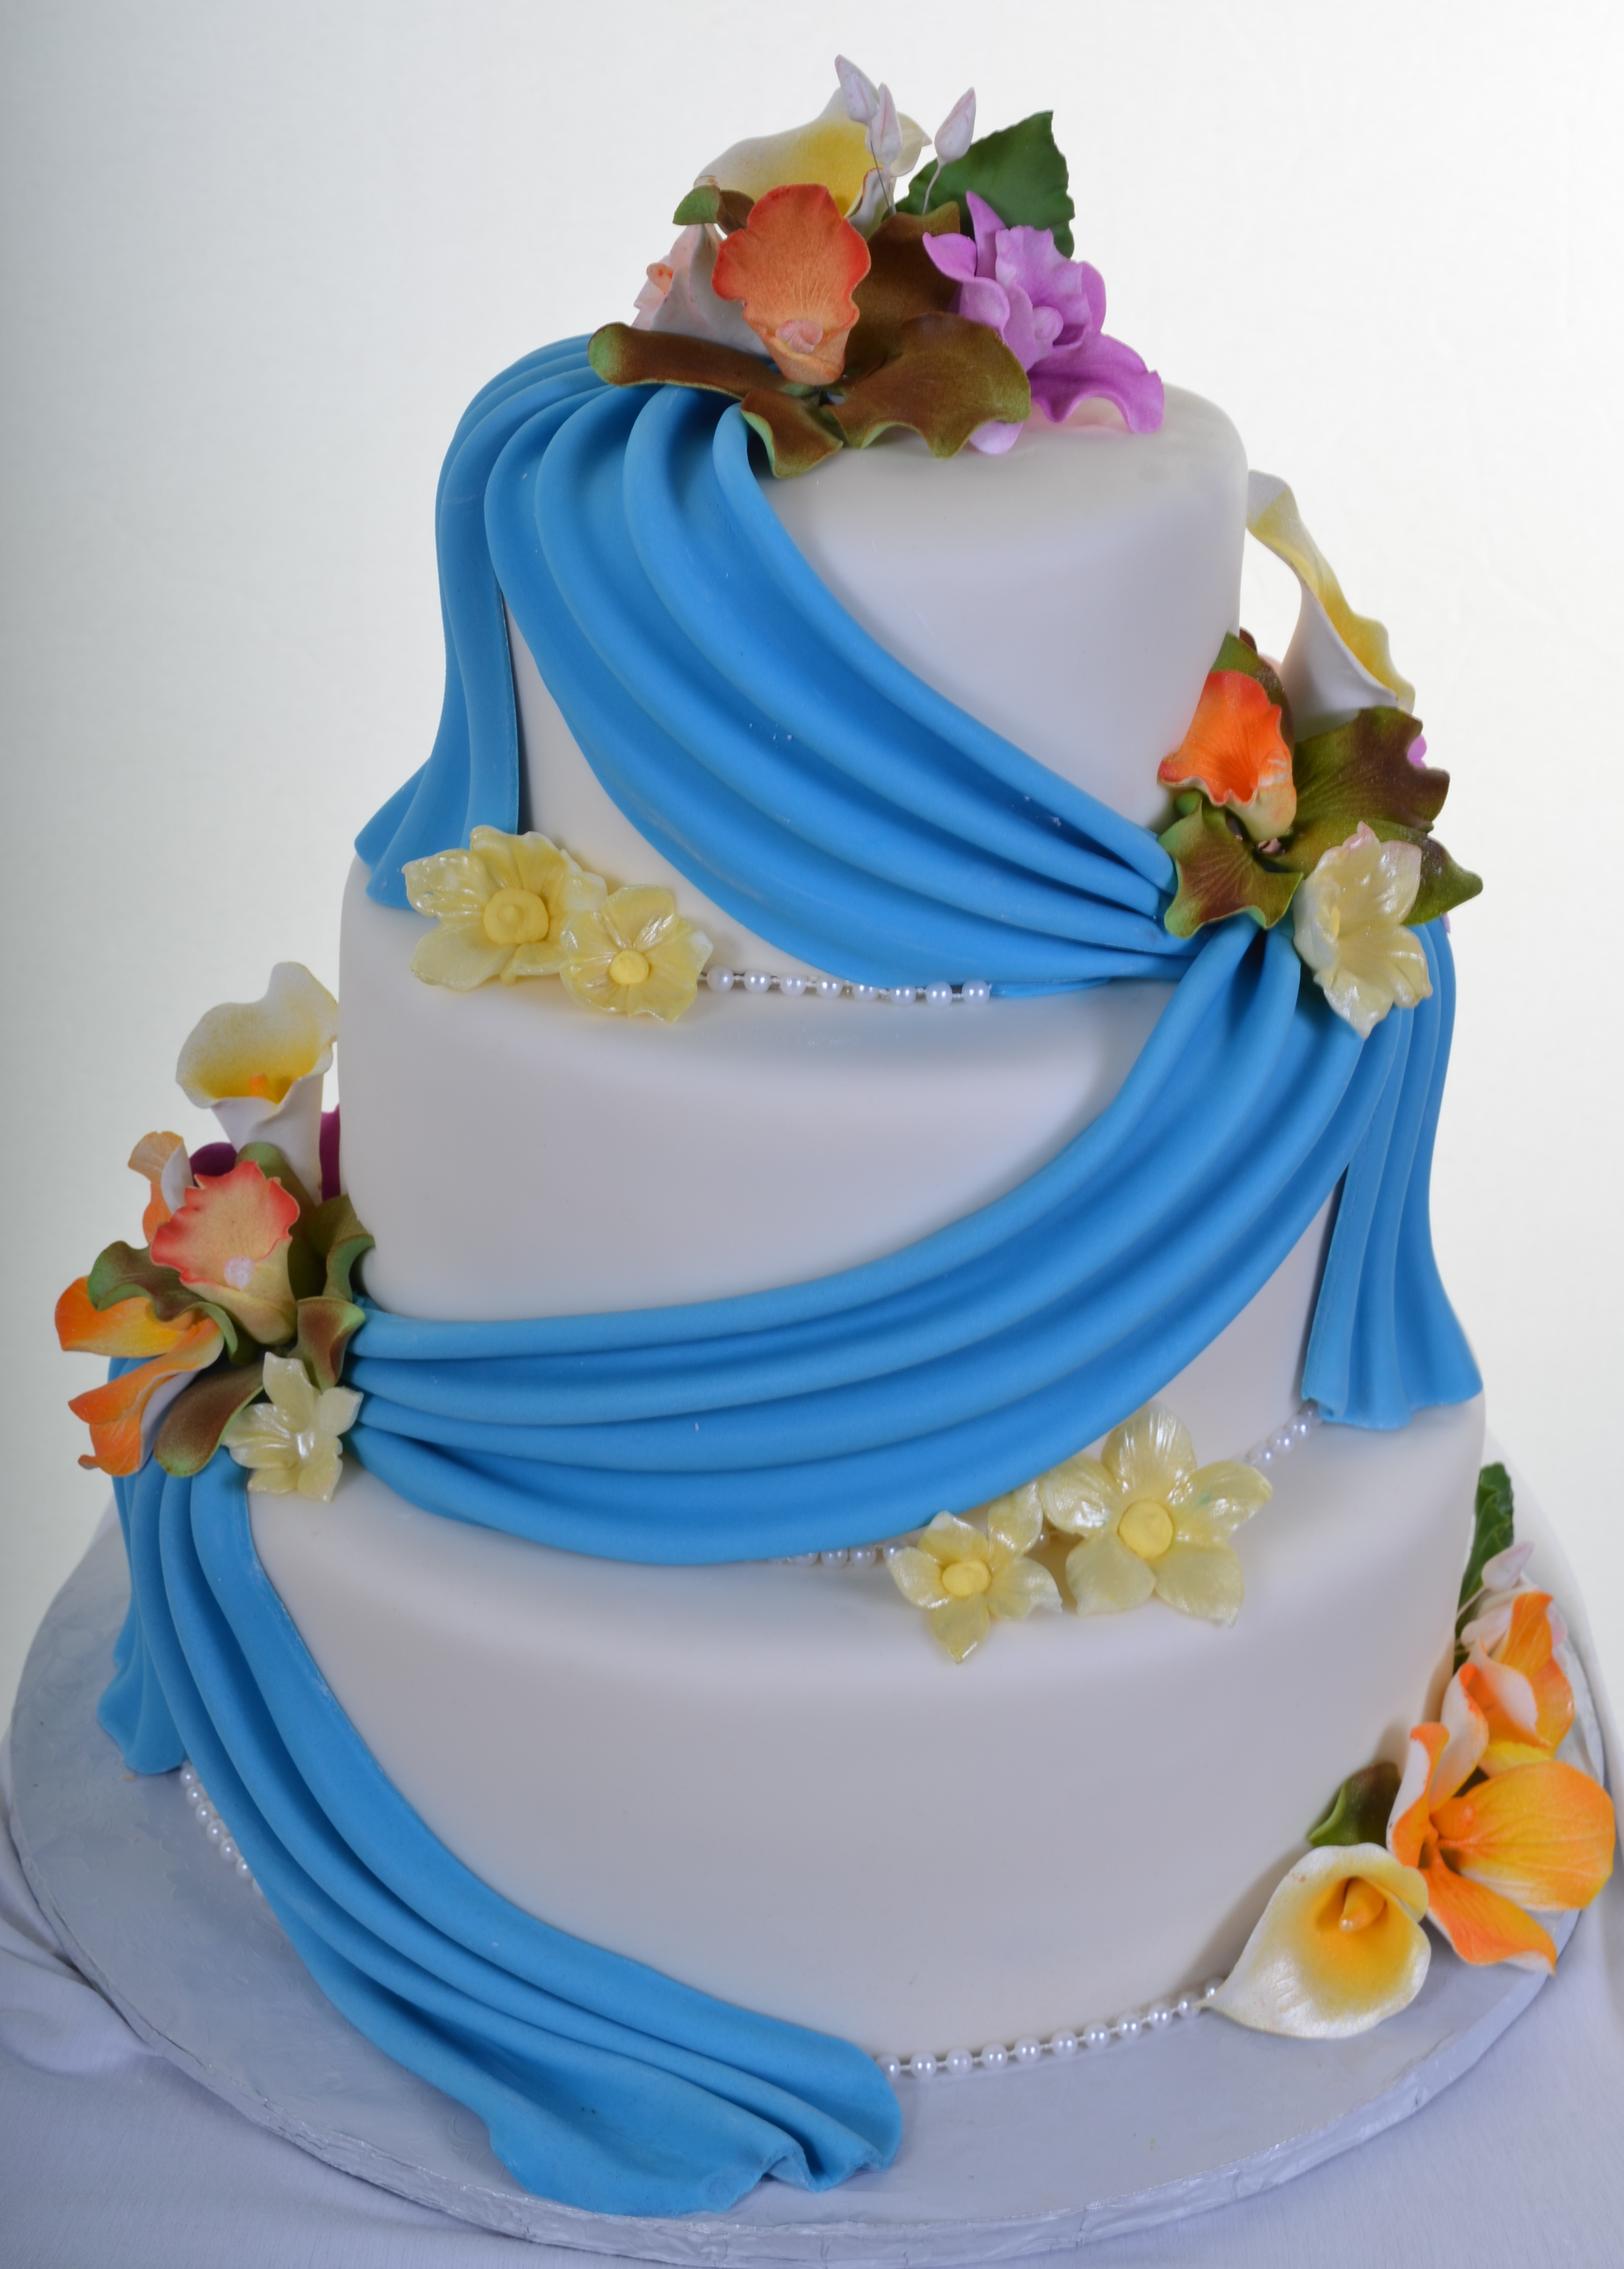 Pastry Palace Las Vegas - Wedding Cake 793 - Color Me Vibrant